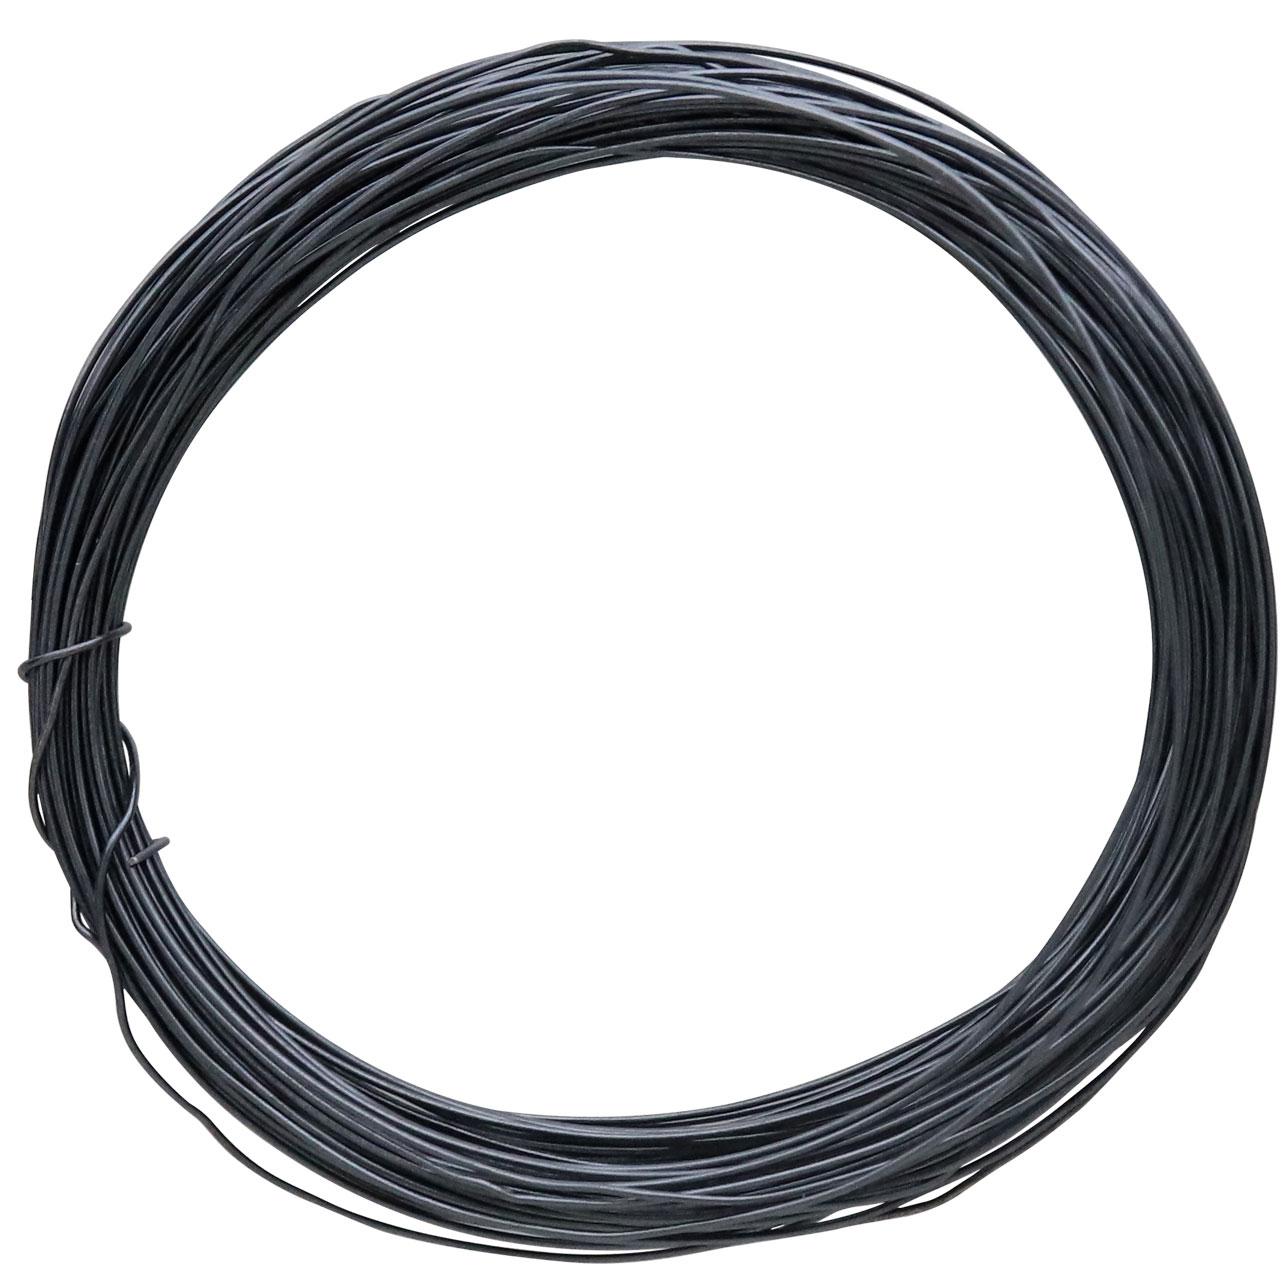 Black Oxidized Sterling Silver Dead Soft Wire .5oz 26 gauge